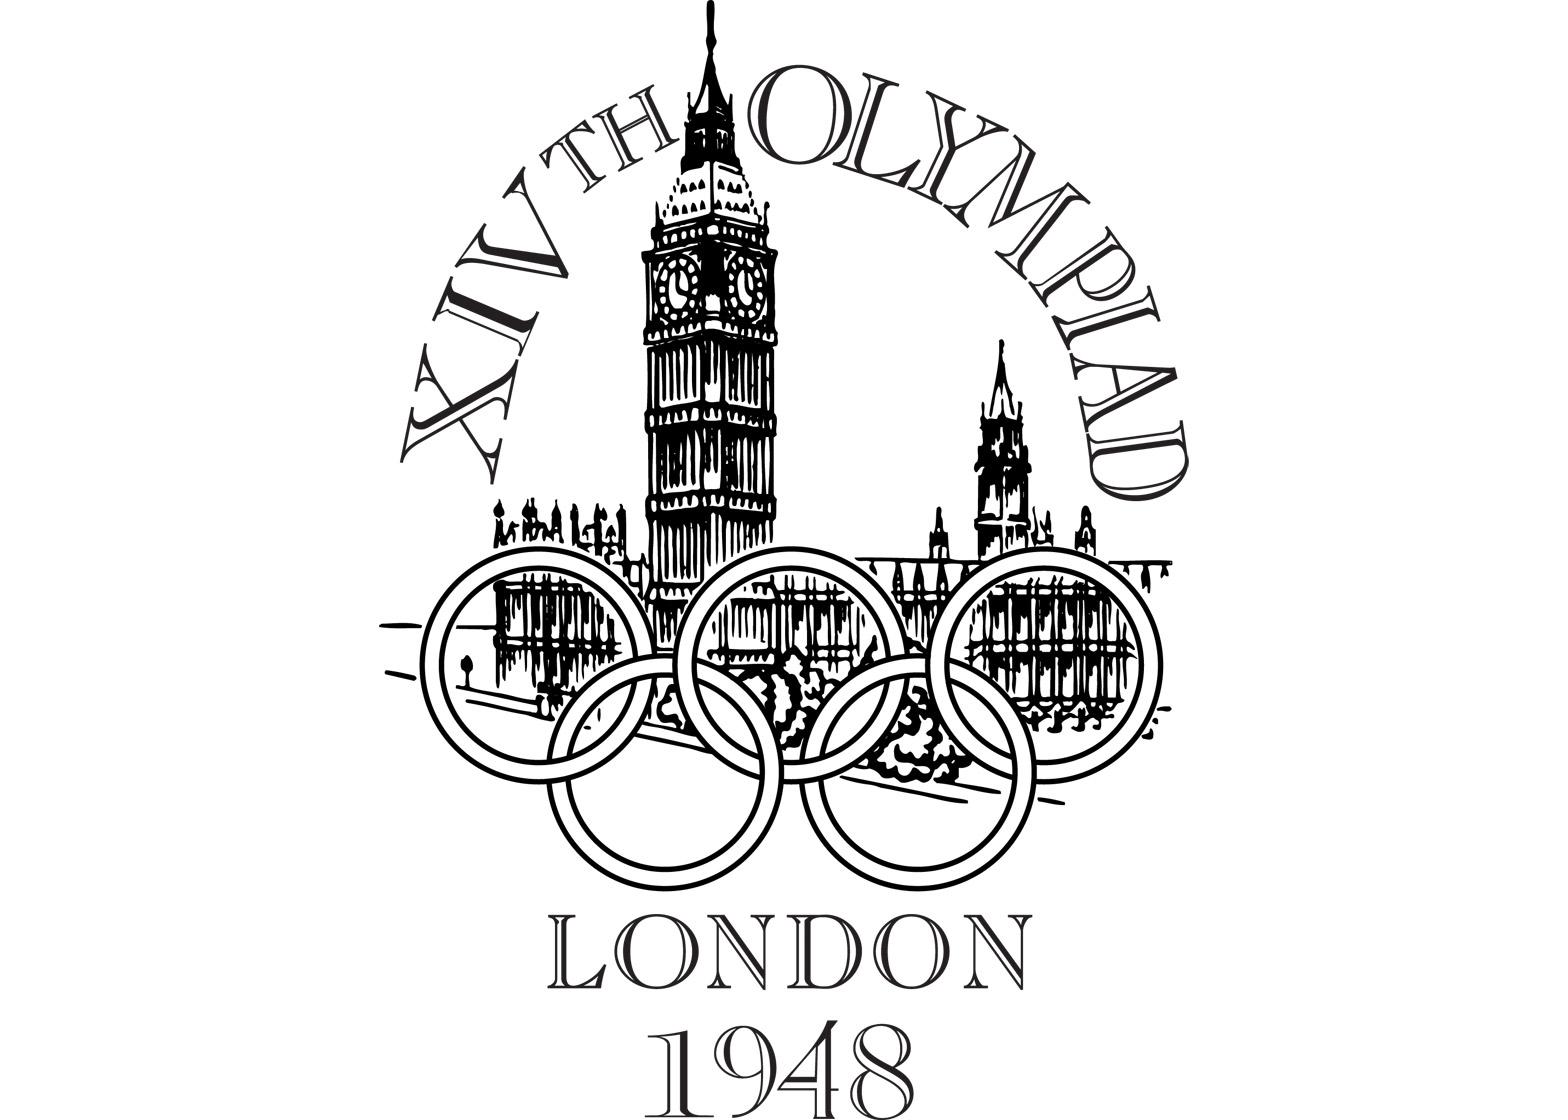 Logo of the 1948 London Olympics